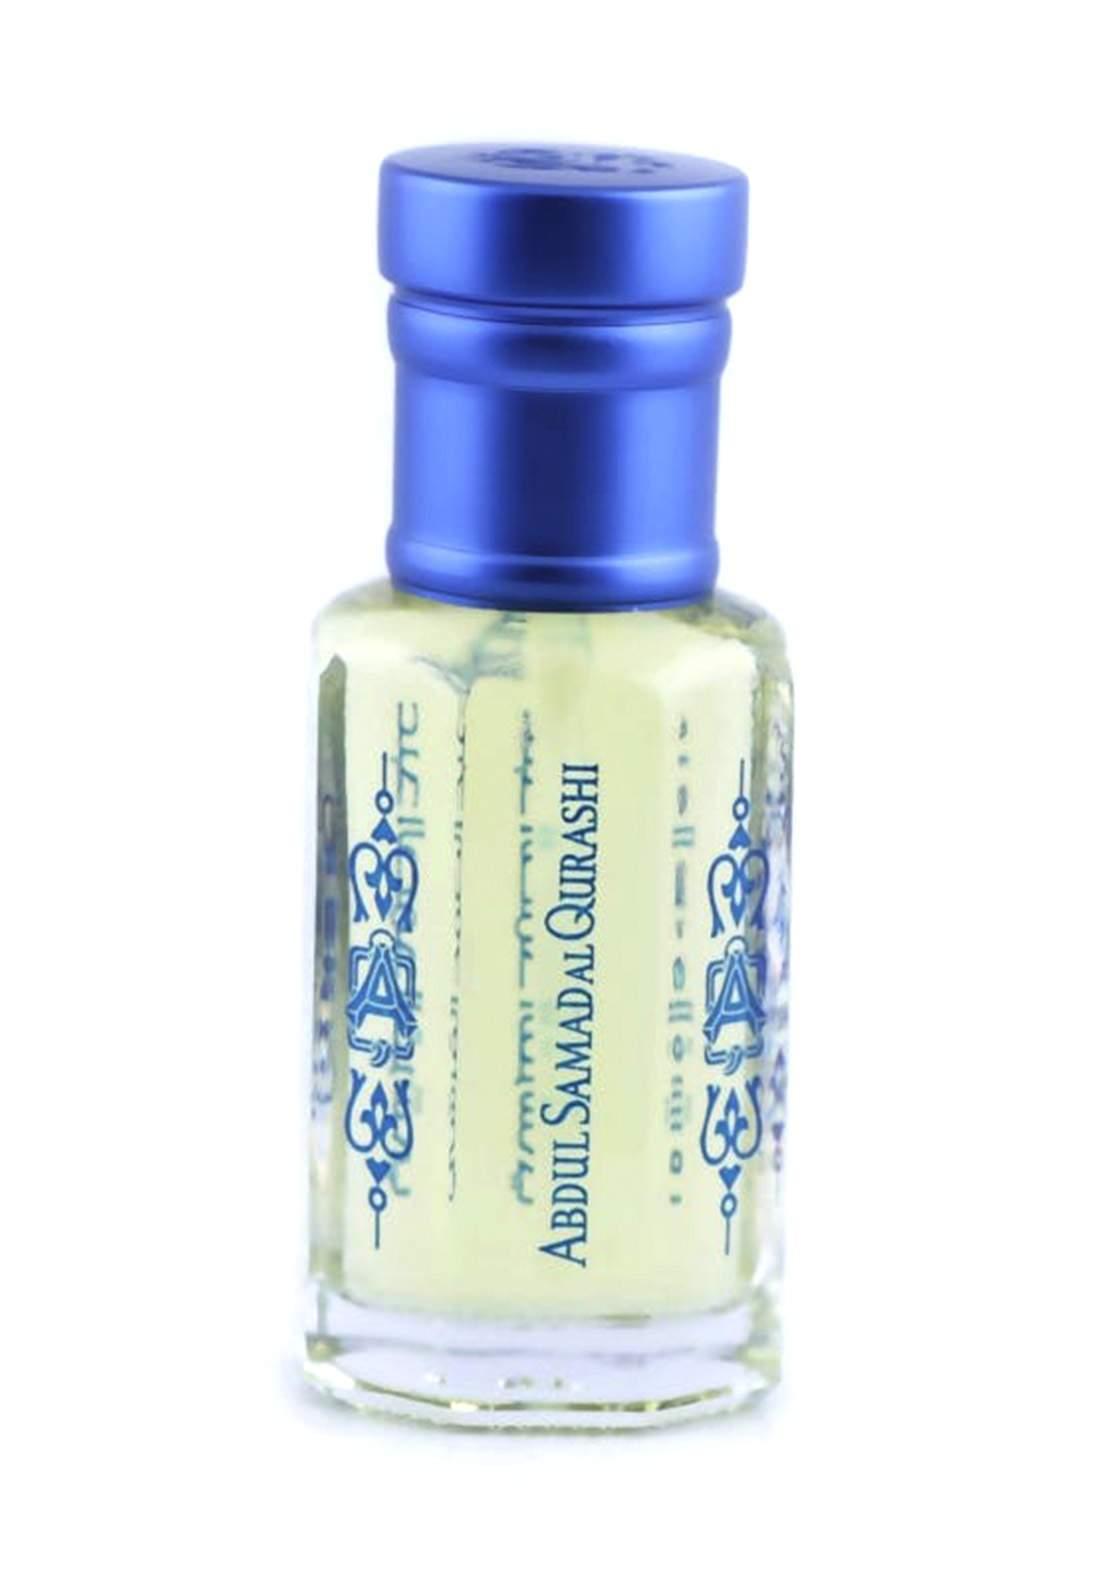 Abdul Samad Al Qurashi 13152 Blueberry Musk Perfume Oil عطر زيتي رجالي ونسائي